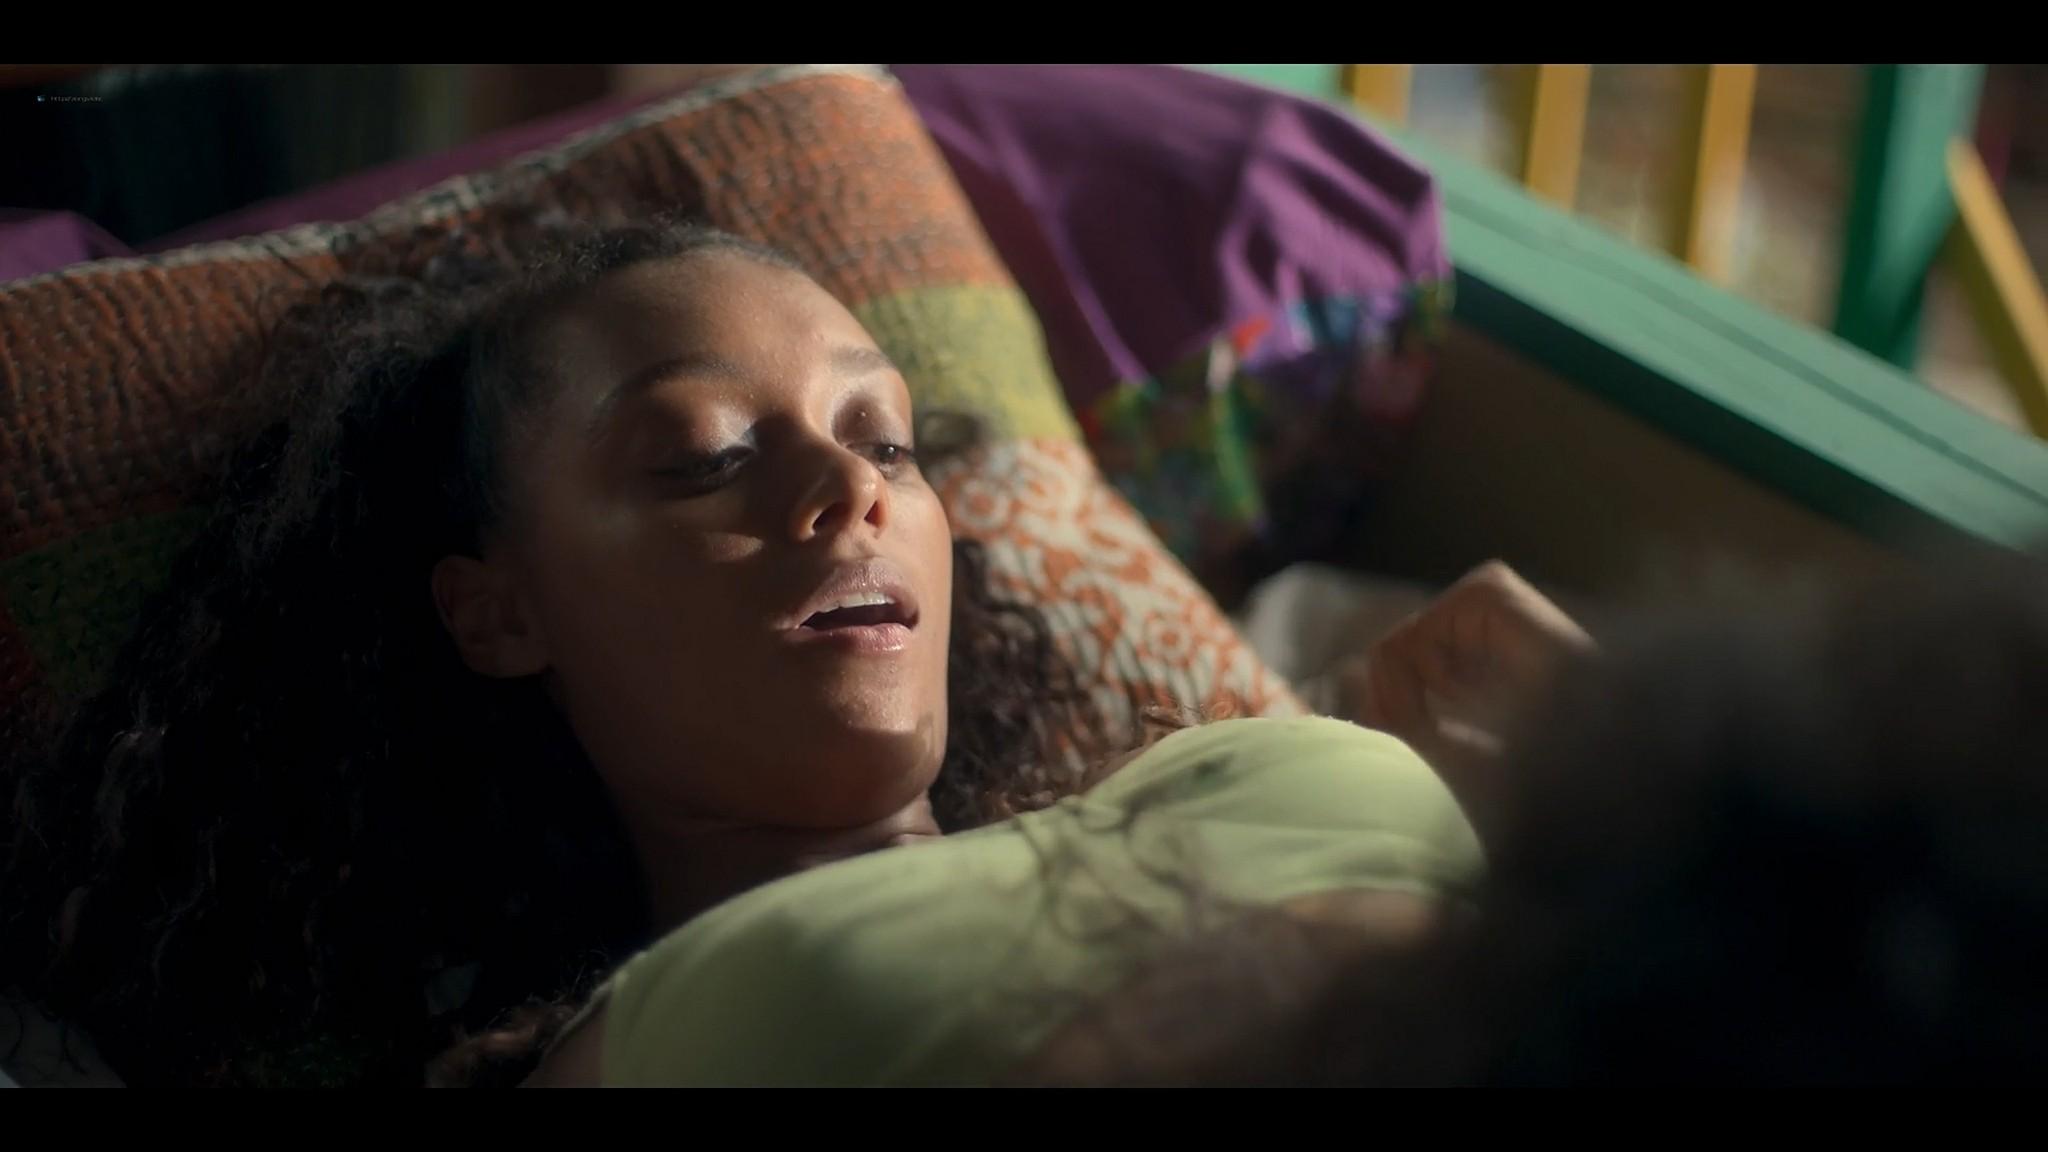 BeBe Bettencourt sexy Sophie Wilde Priscilla Doueihy hot lesbian sex Eden AU 2021 s1e4 8 1080p Web 12